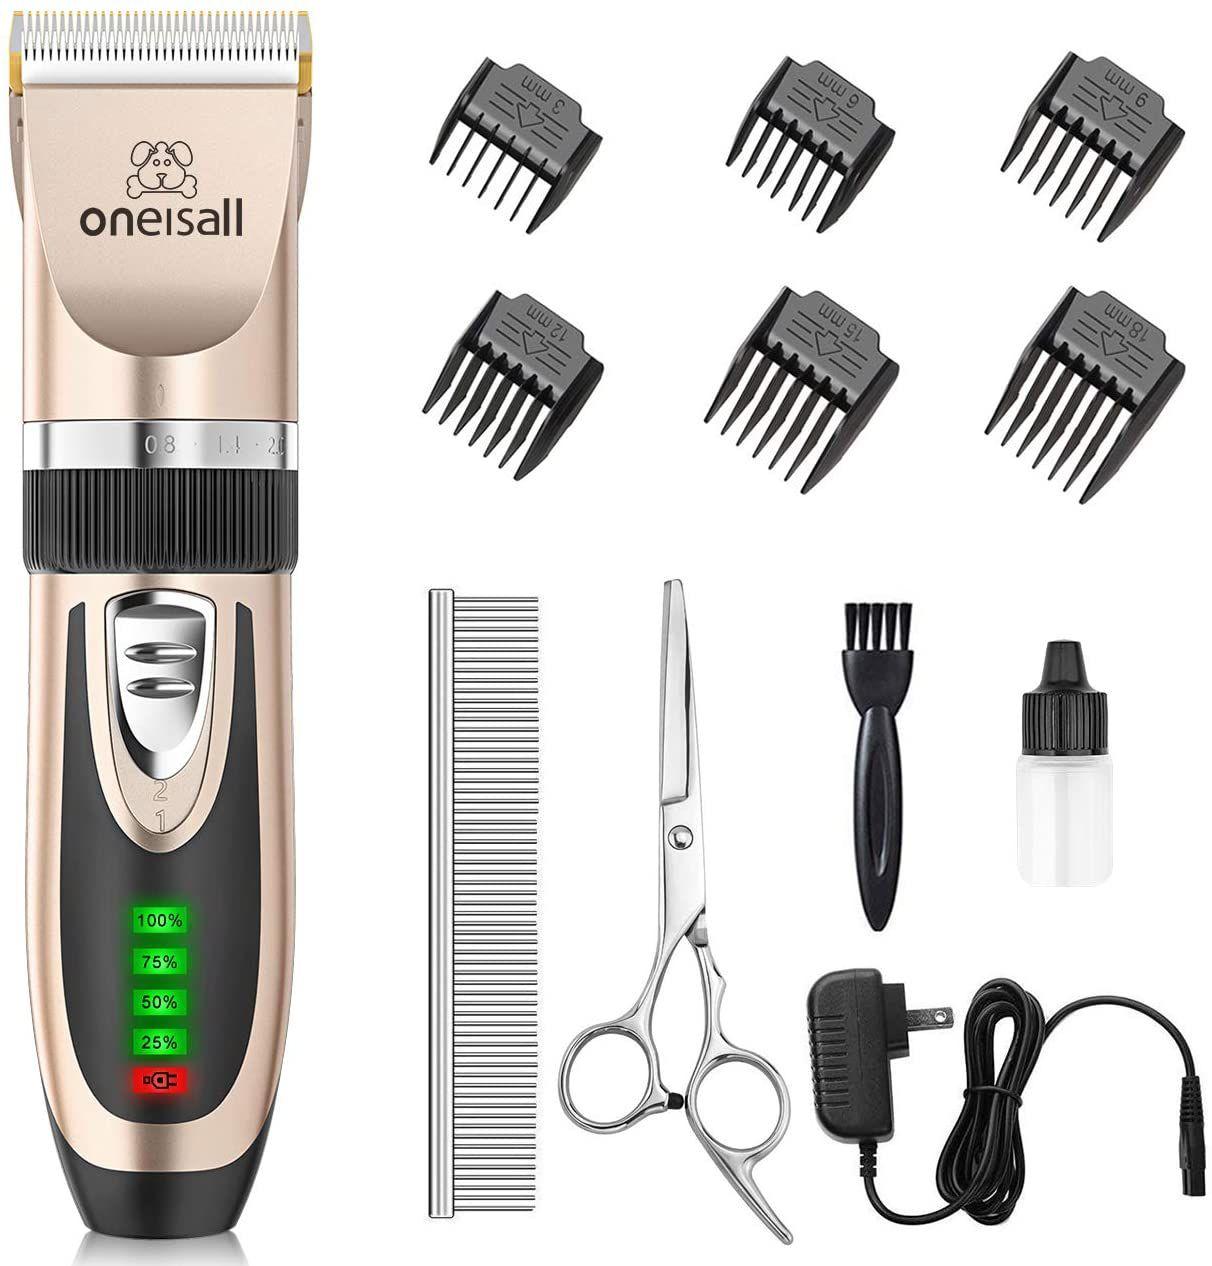 oneisall Cordless Dog Grooming Kit